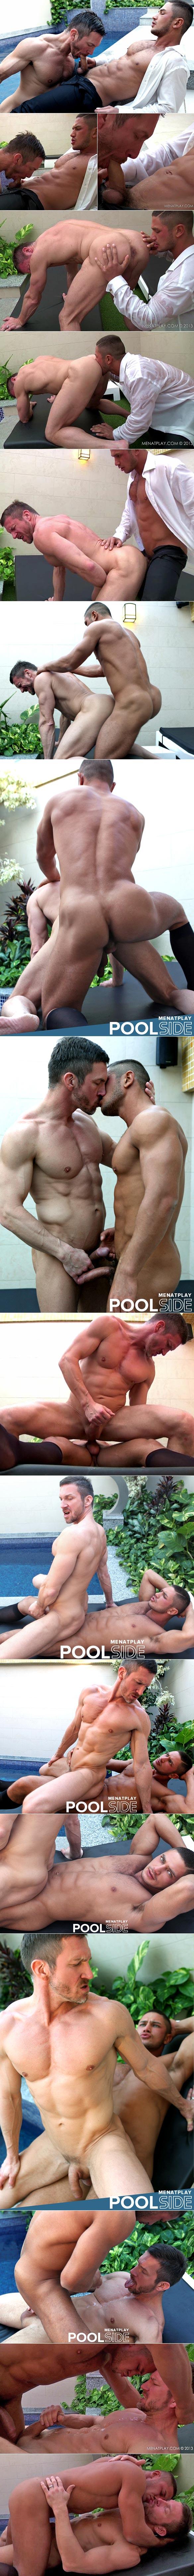 "MenAtPlay: Newcomer Dato Foland tops Tomas Brand in ""Poolside"""